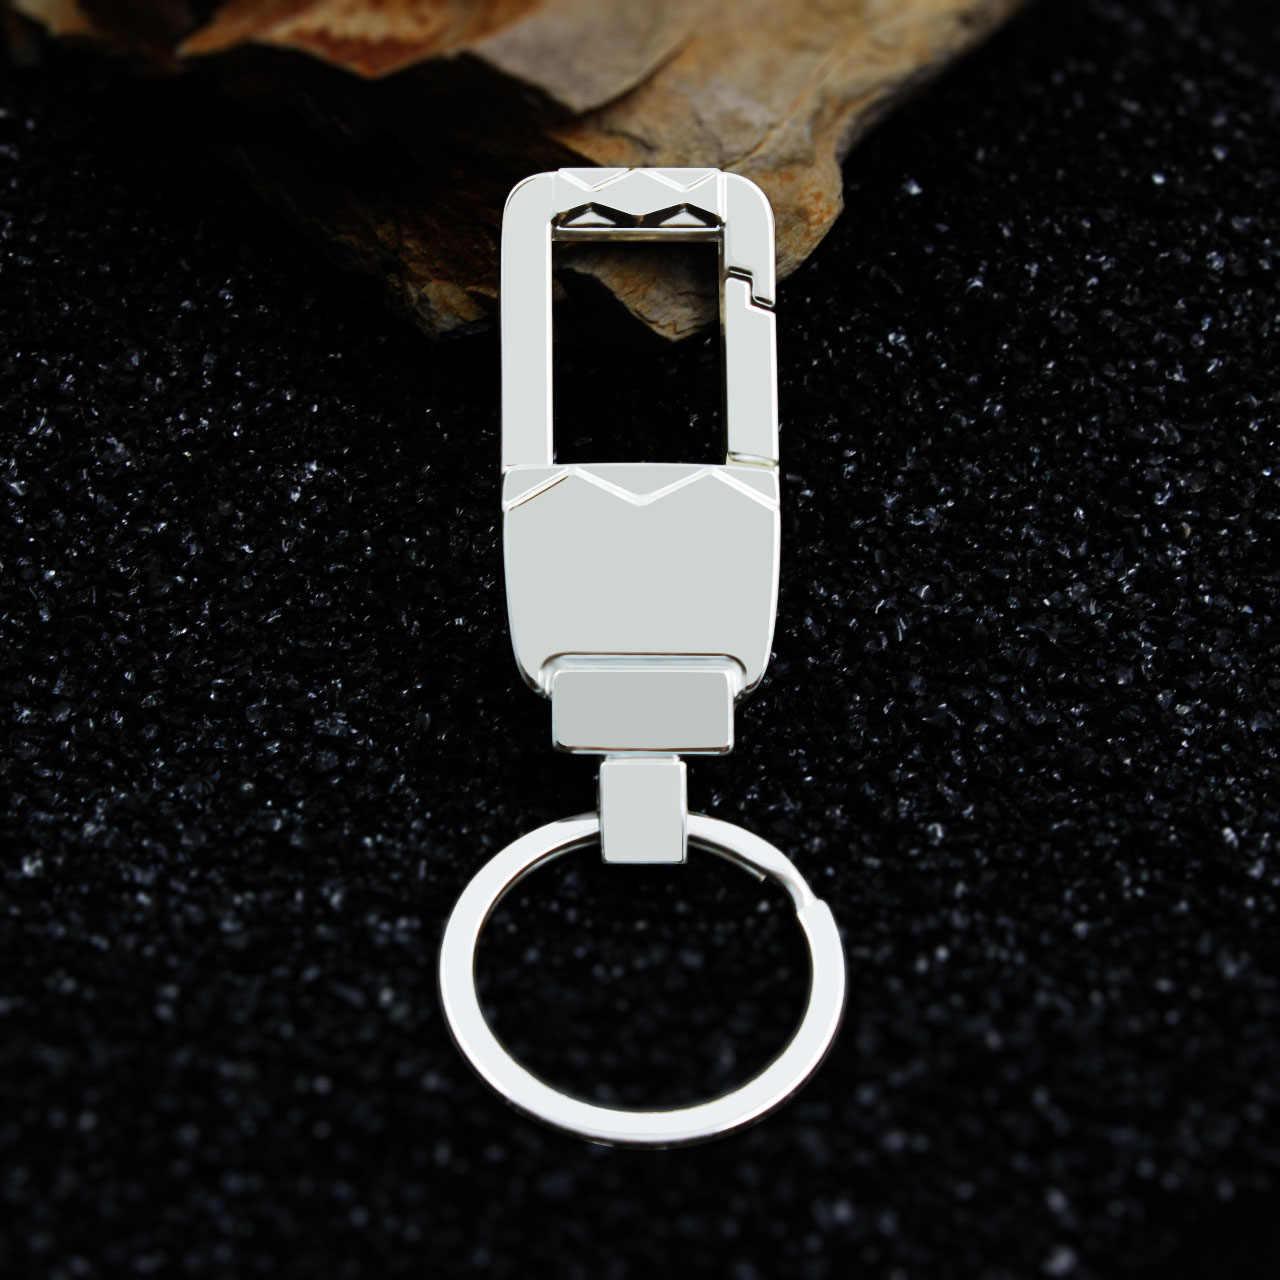 Hot Fashion Men Metal Keychain Car Key Ring Open Promotional Advertising Unlock Custom best Party Gift Jewelry K1523